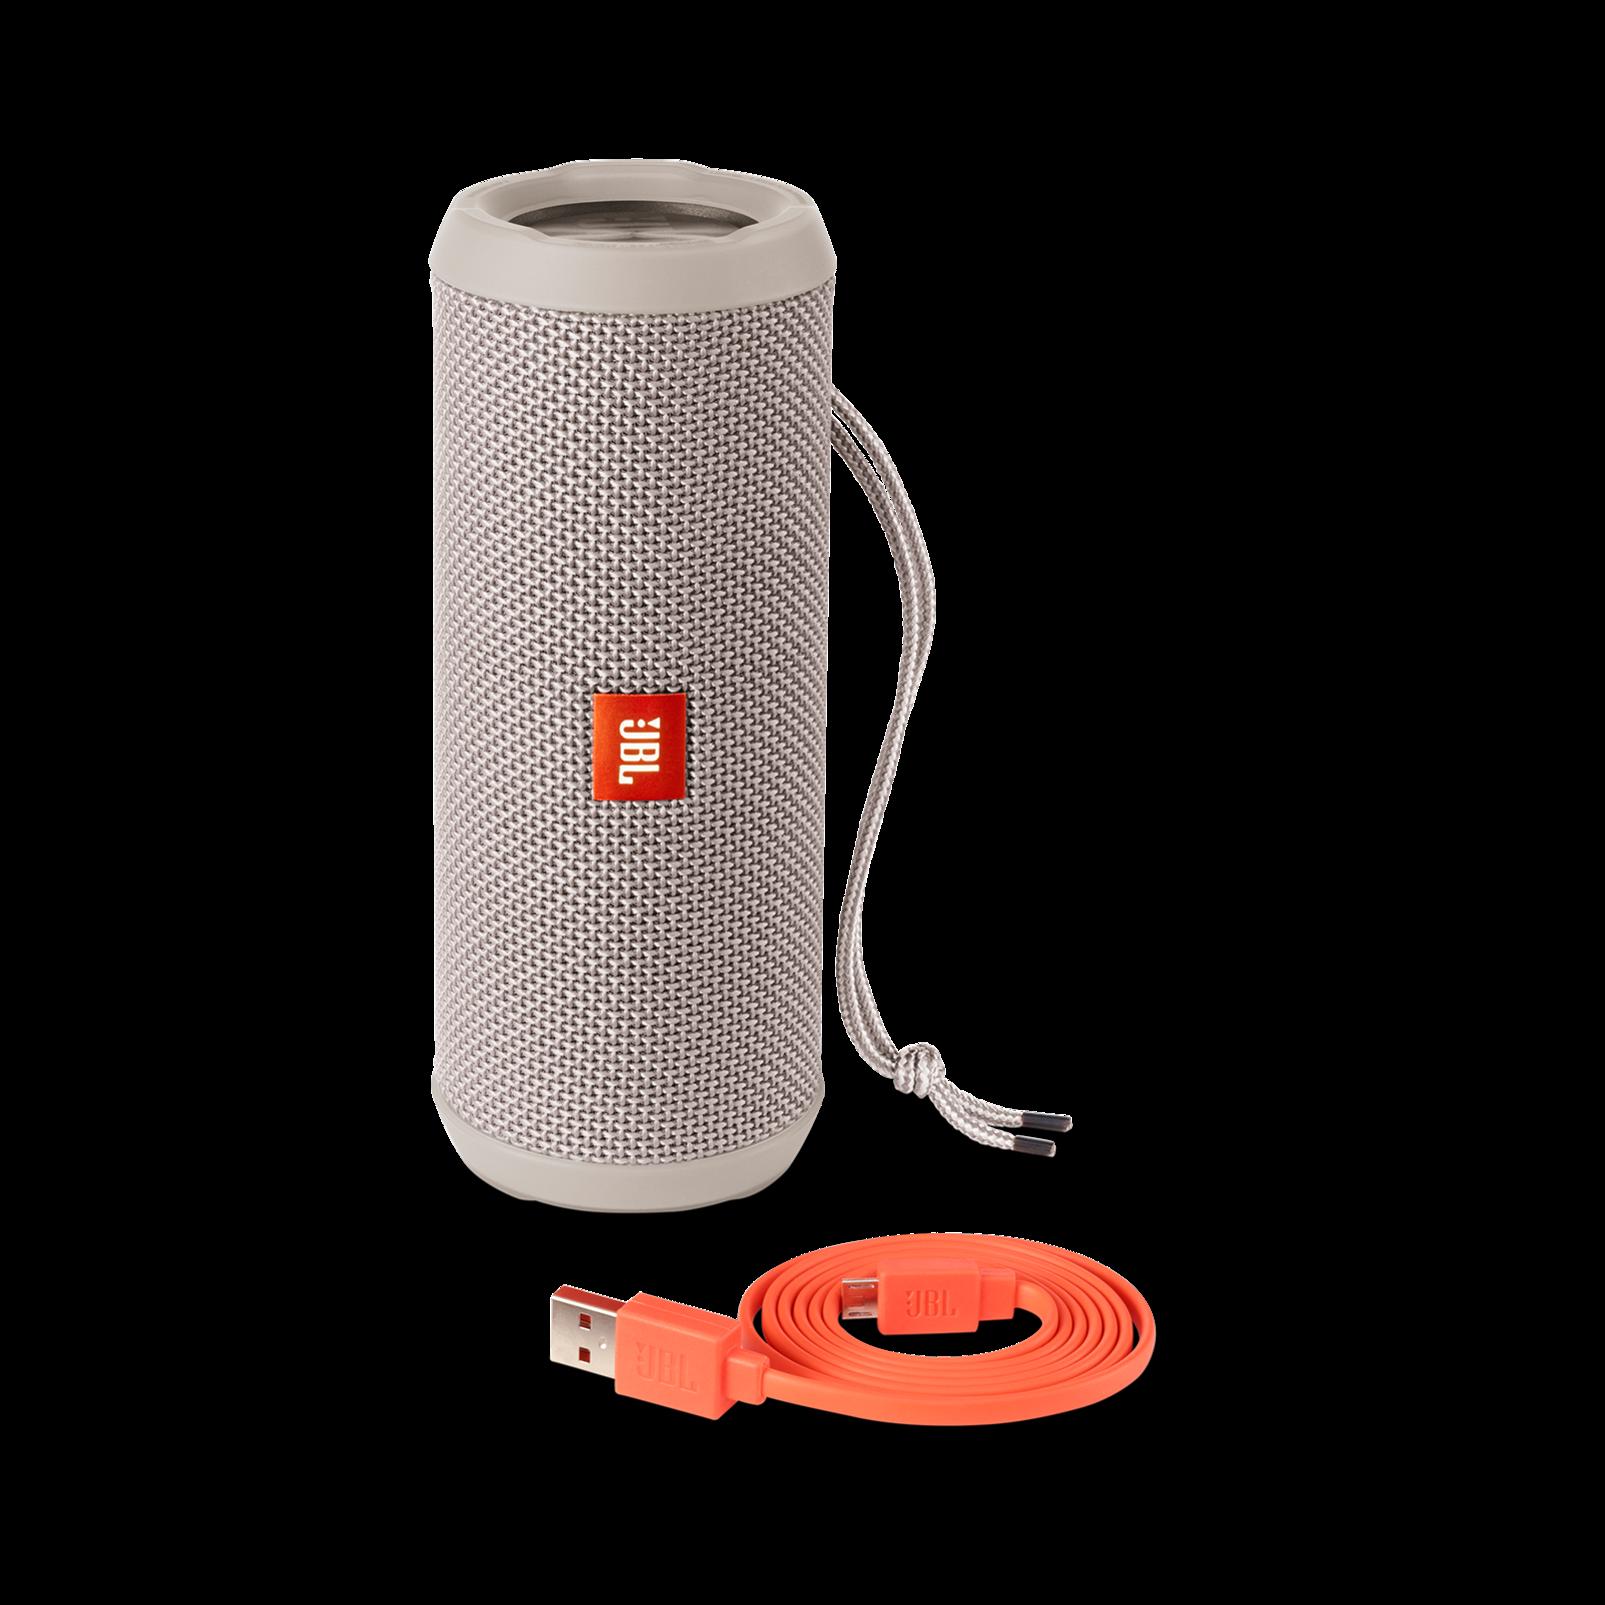 JBL Flip 3 - Grey - Splashproof portable Bluetooth speaker with powerful sound and speakerphone technology - Detailshot 4